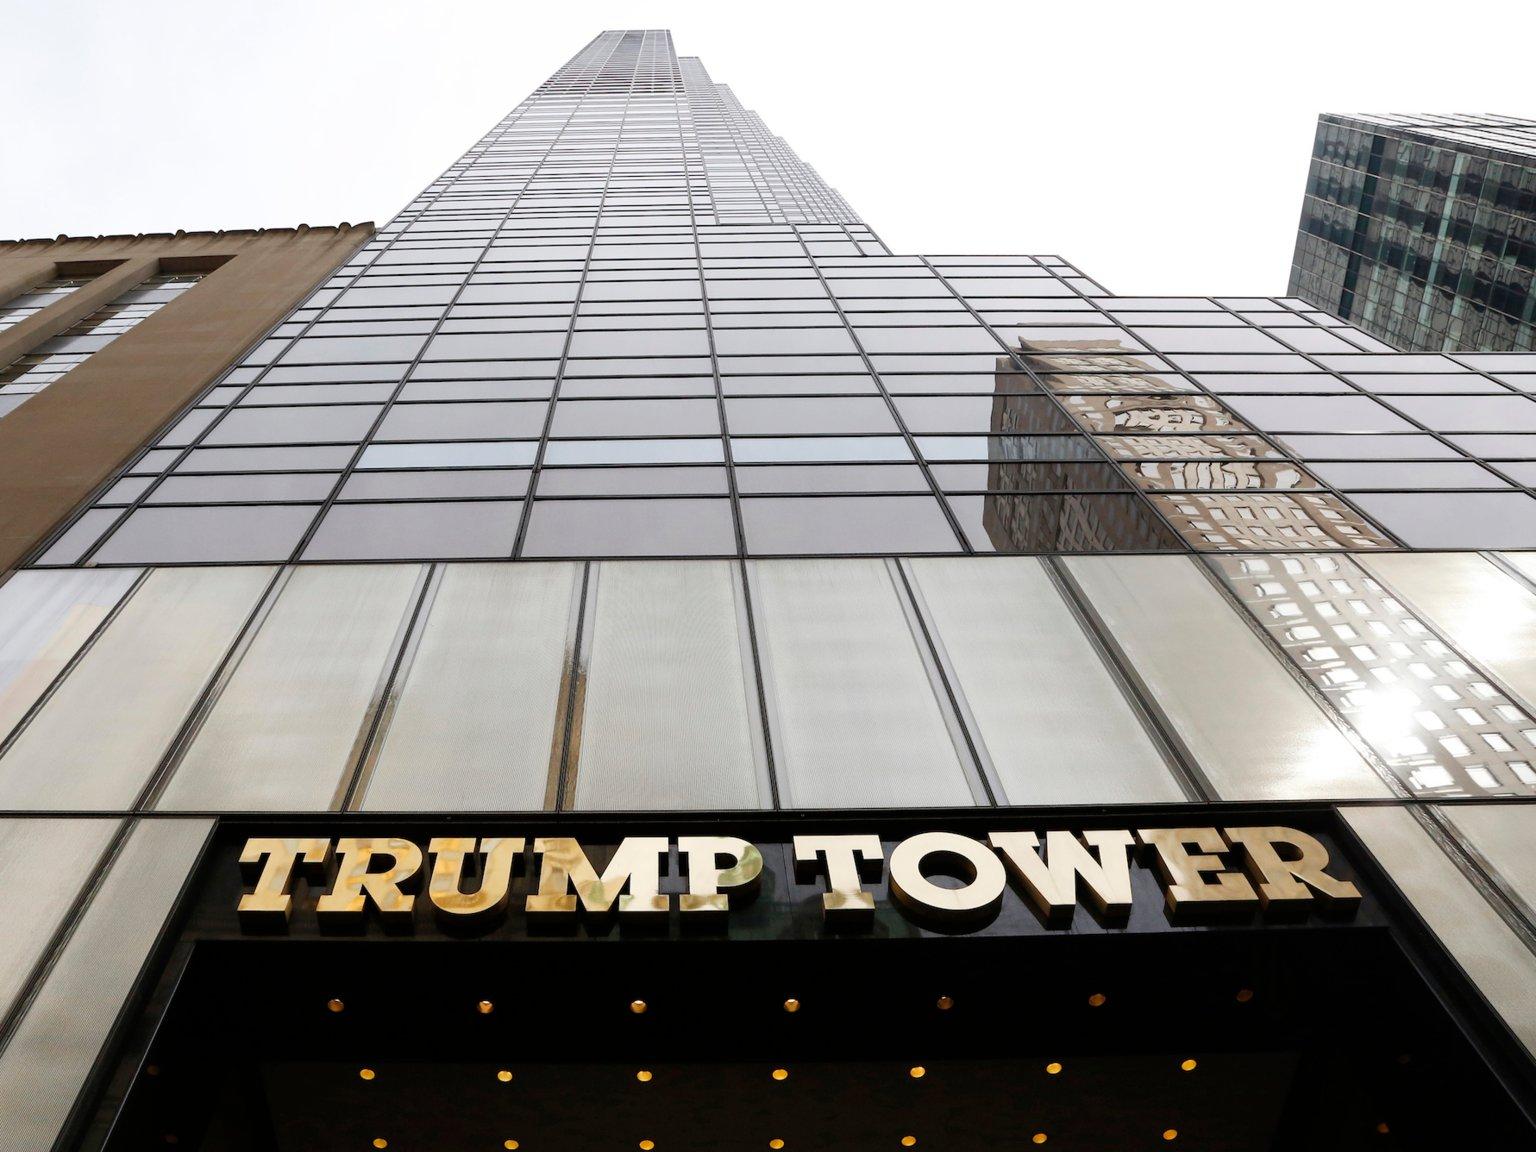 donald trump - trump2 1569235332 - Khối bất động sản hơn 122 triệu USD của Trump có gì?